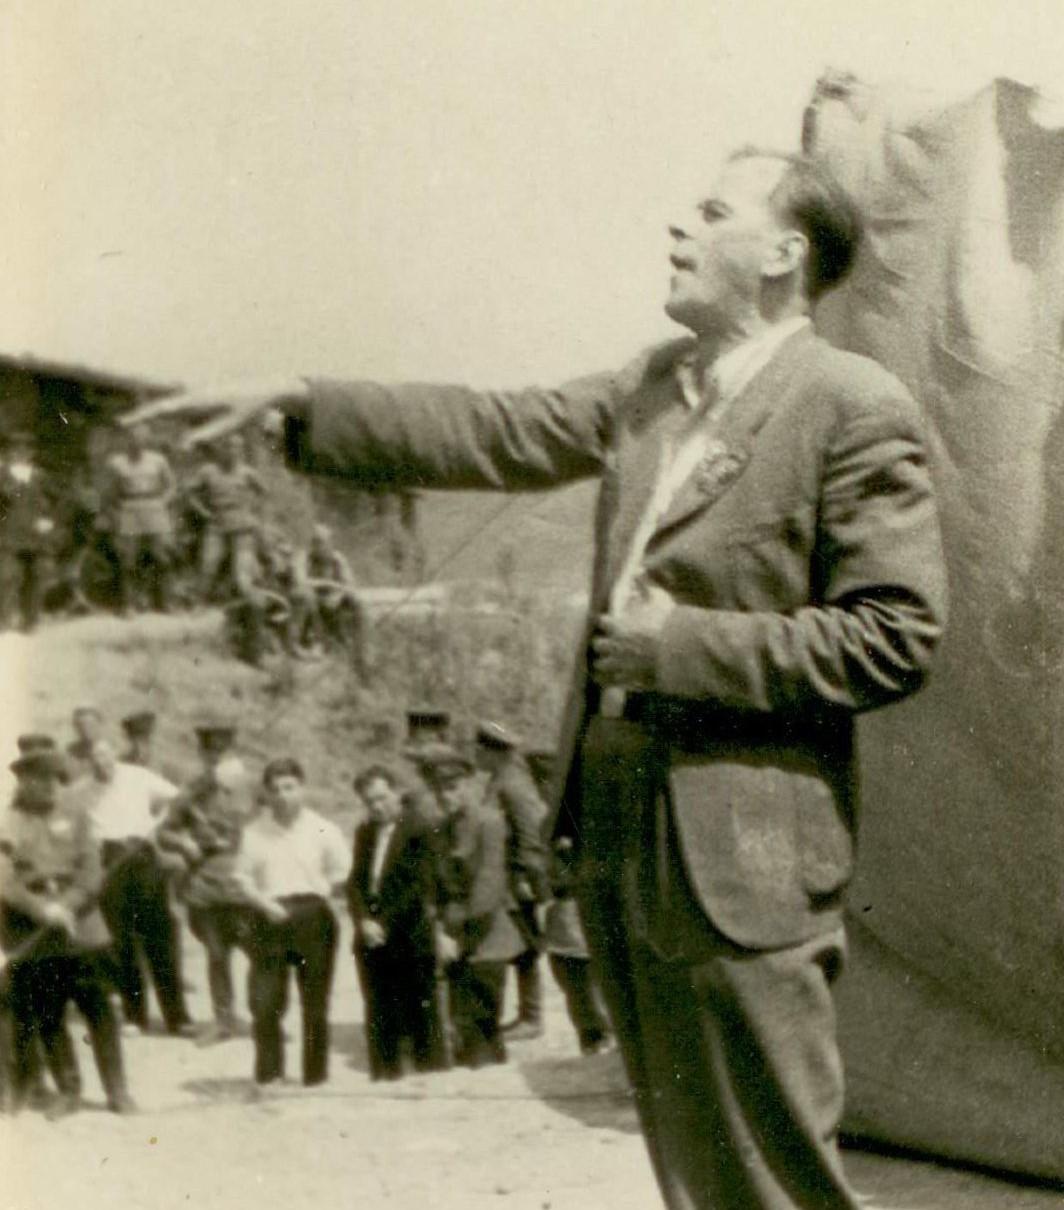 Народный артист России Н. Черкасов в районе озера Хасан. Август 1939 года. Фото А. Борзунина